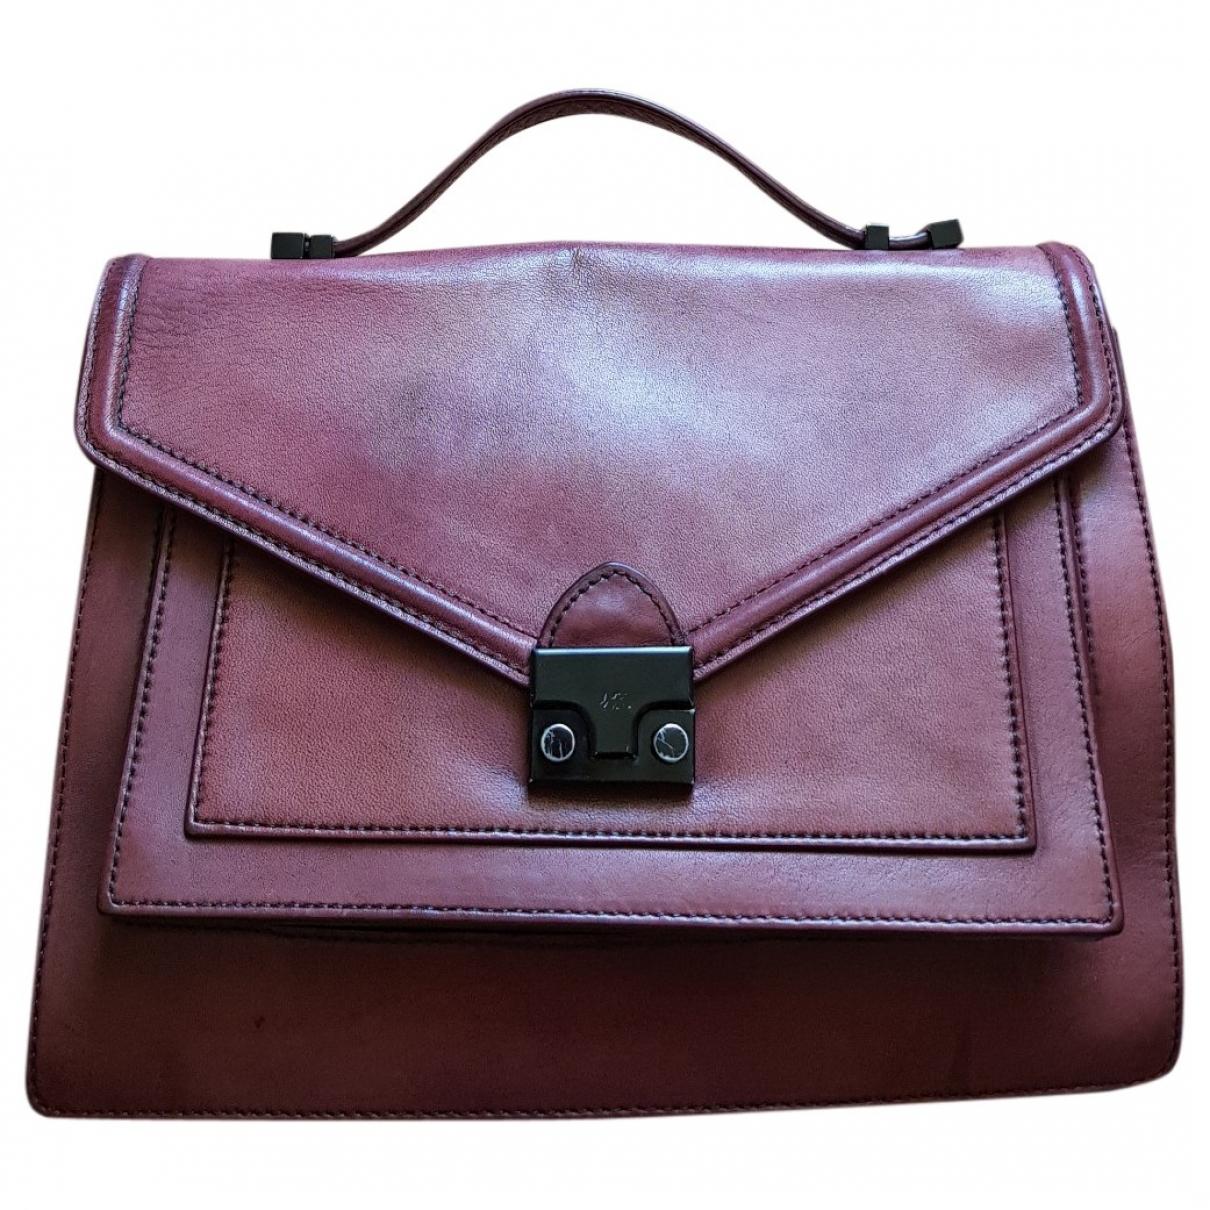 Loeffler Randall \N Handtasche in  Bordeauxrot Leder